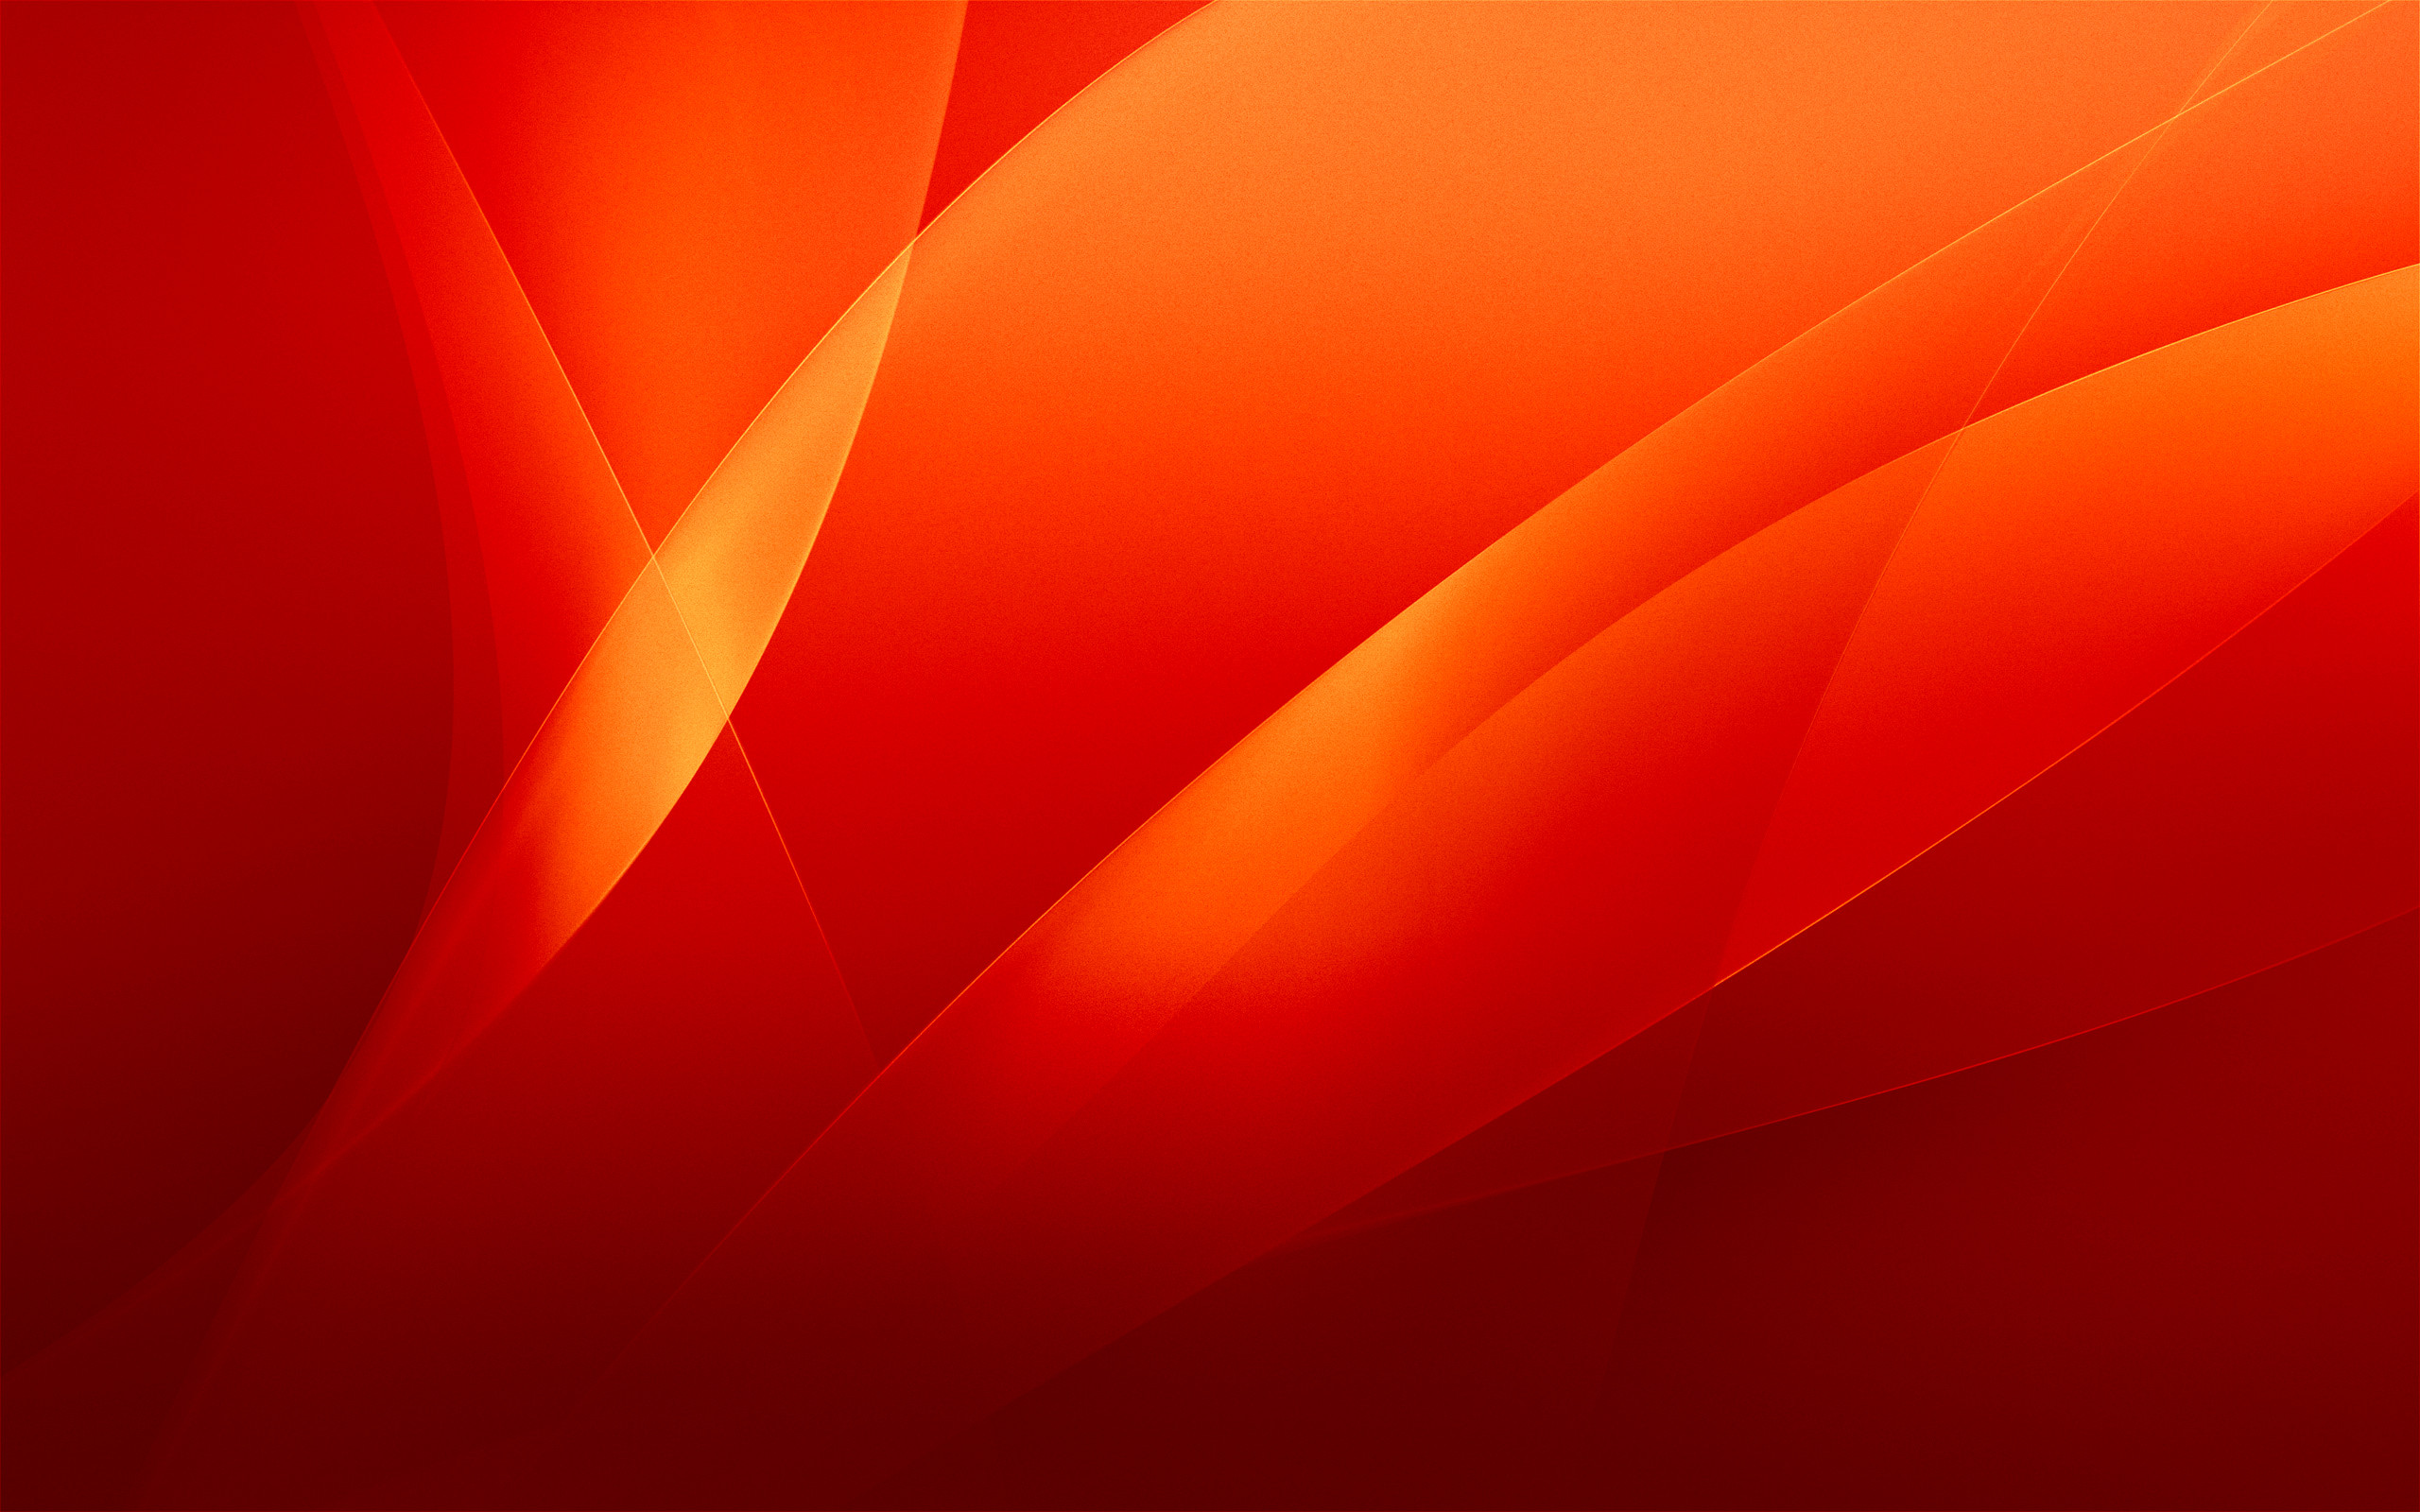 Red Background Wallpaper Free Dekstop